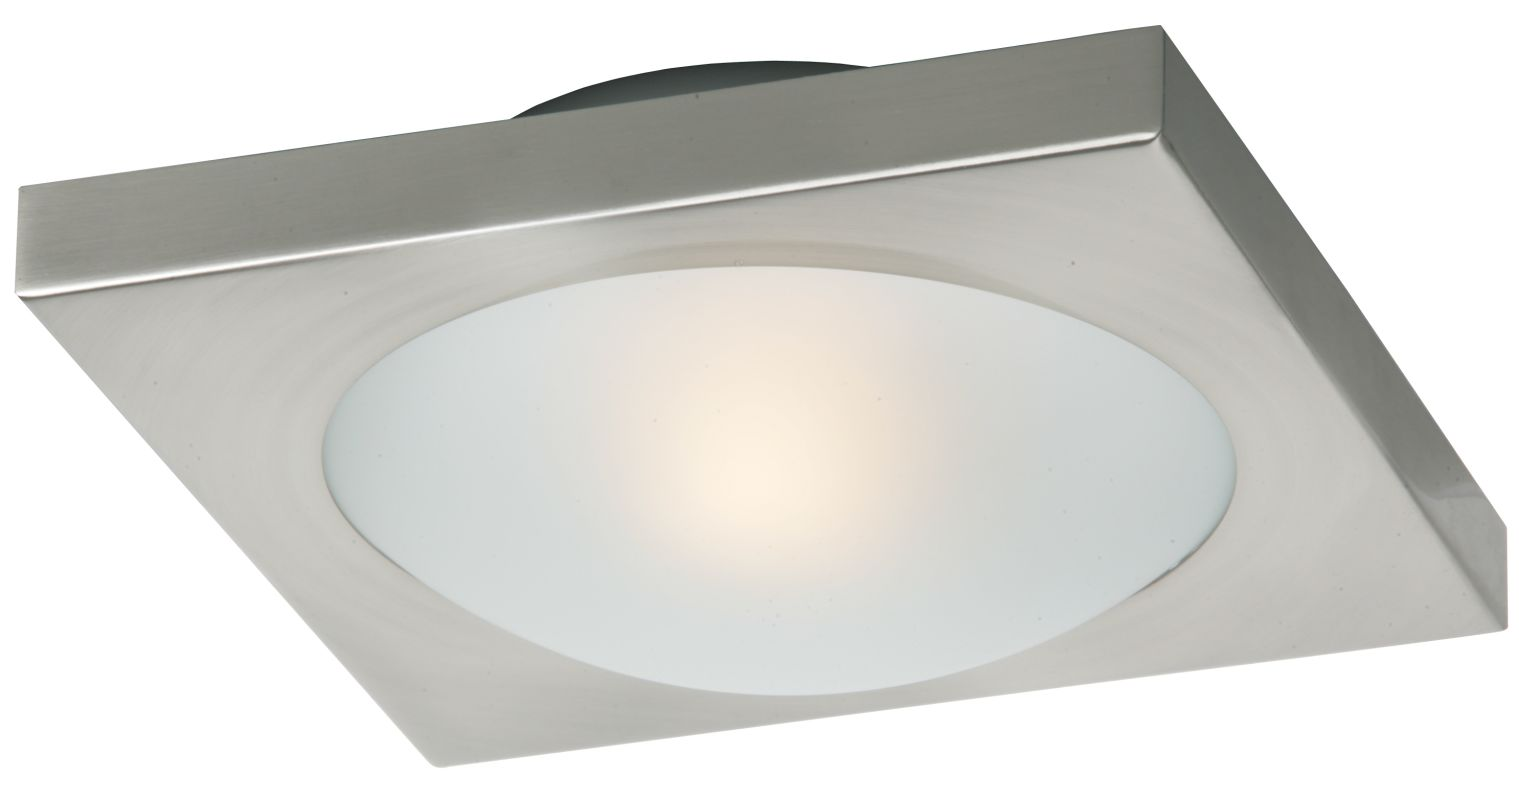 ET2 E20530-09 Satin Nickel Contemporary Piccolo Ceiling Light